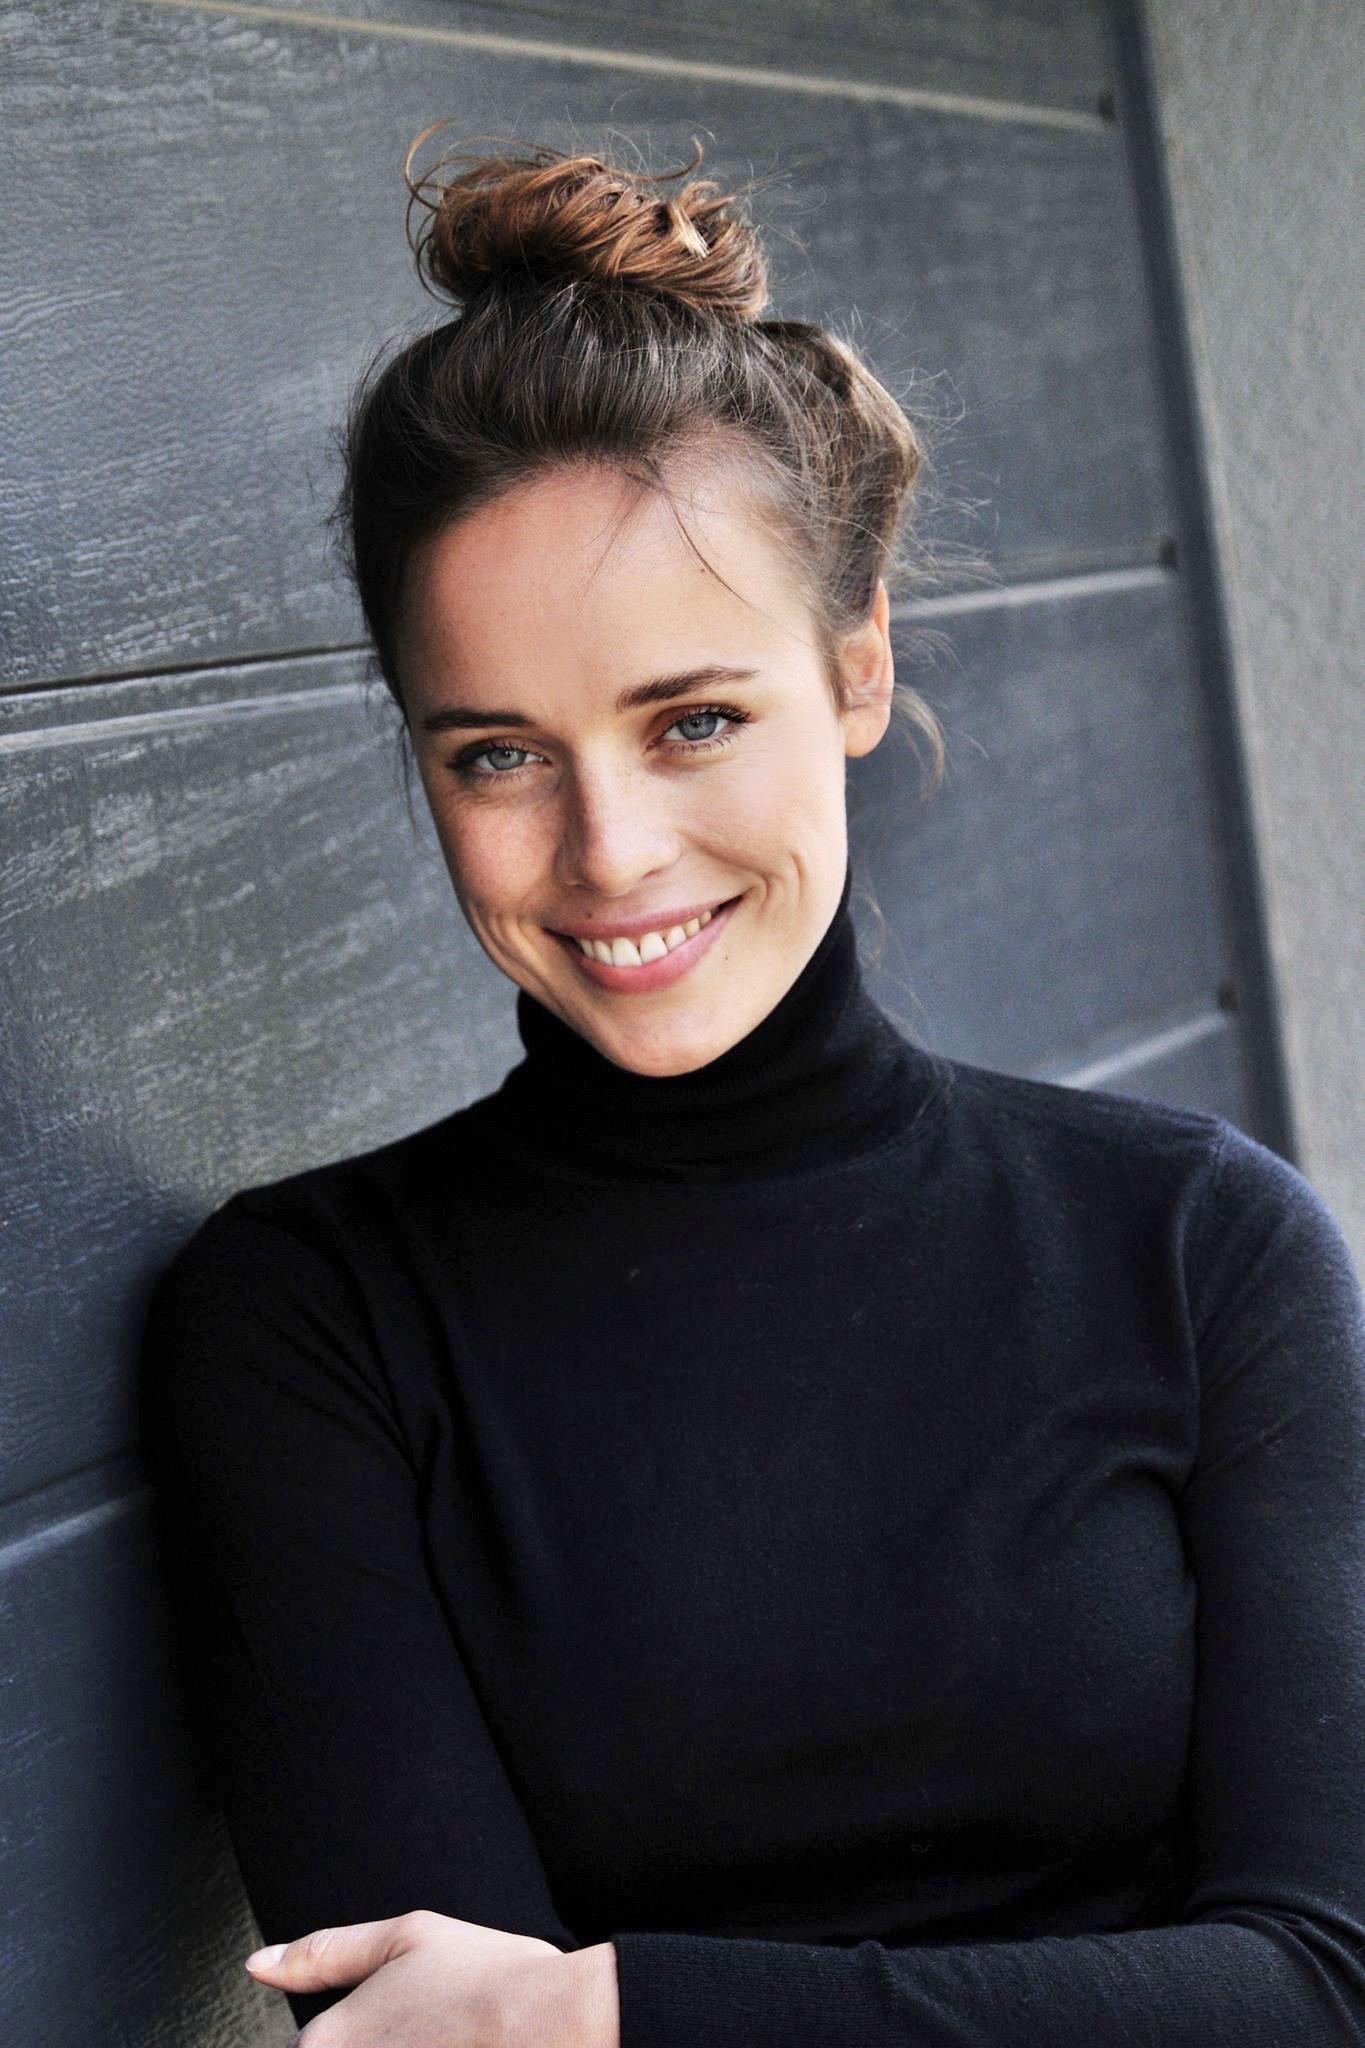 Linda-Marlen Leinweber